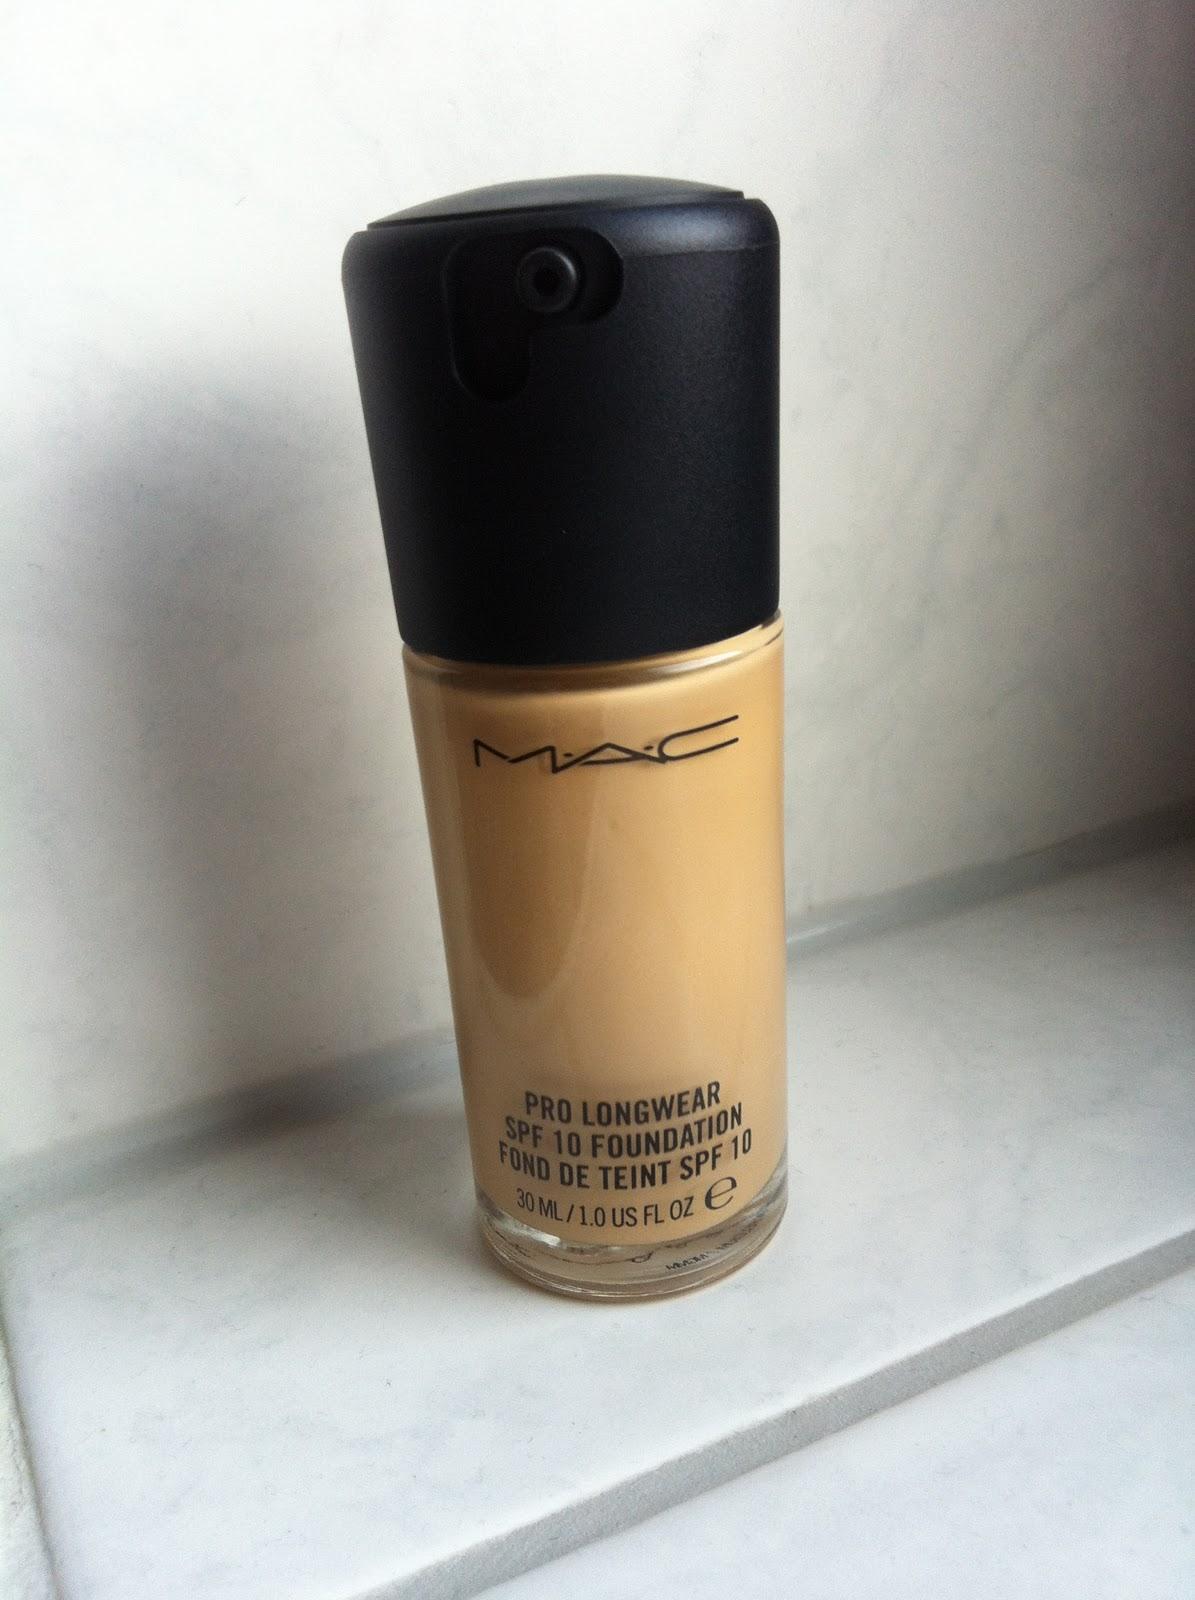 Pro Foundation Mixers By Nyx Professional Makeup: Kaestis.blogspot.de: Ich Bin NC 20... MAC Pro Longwear